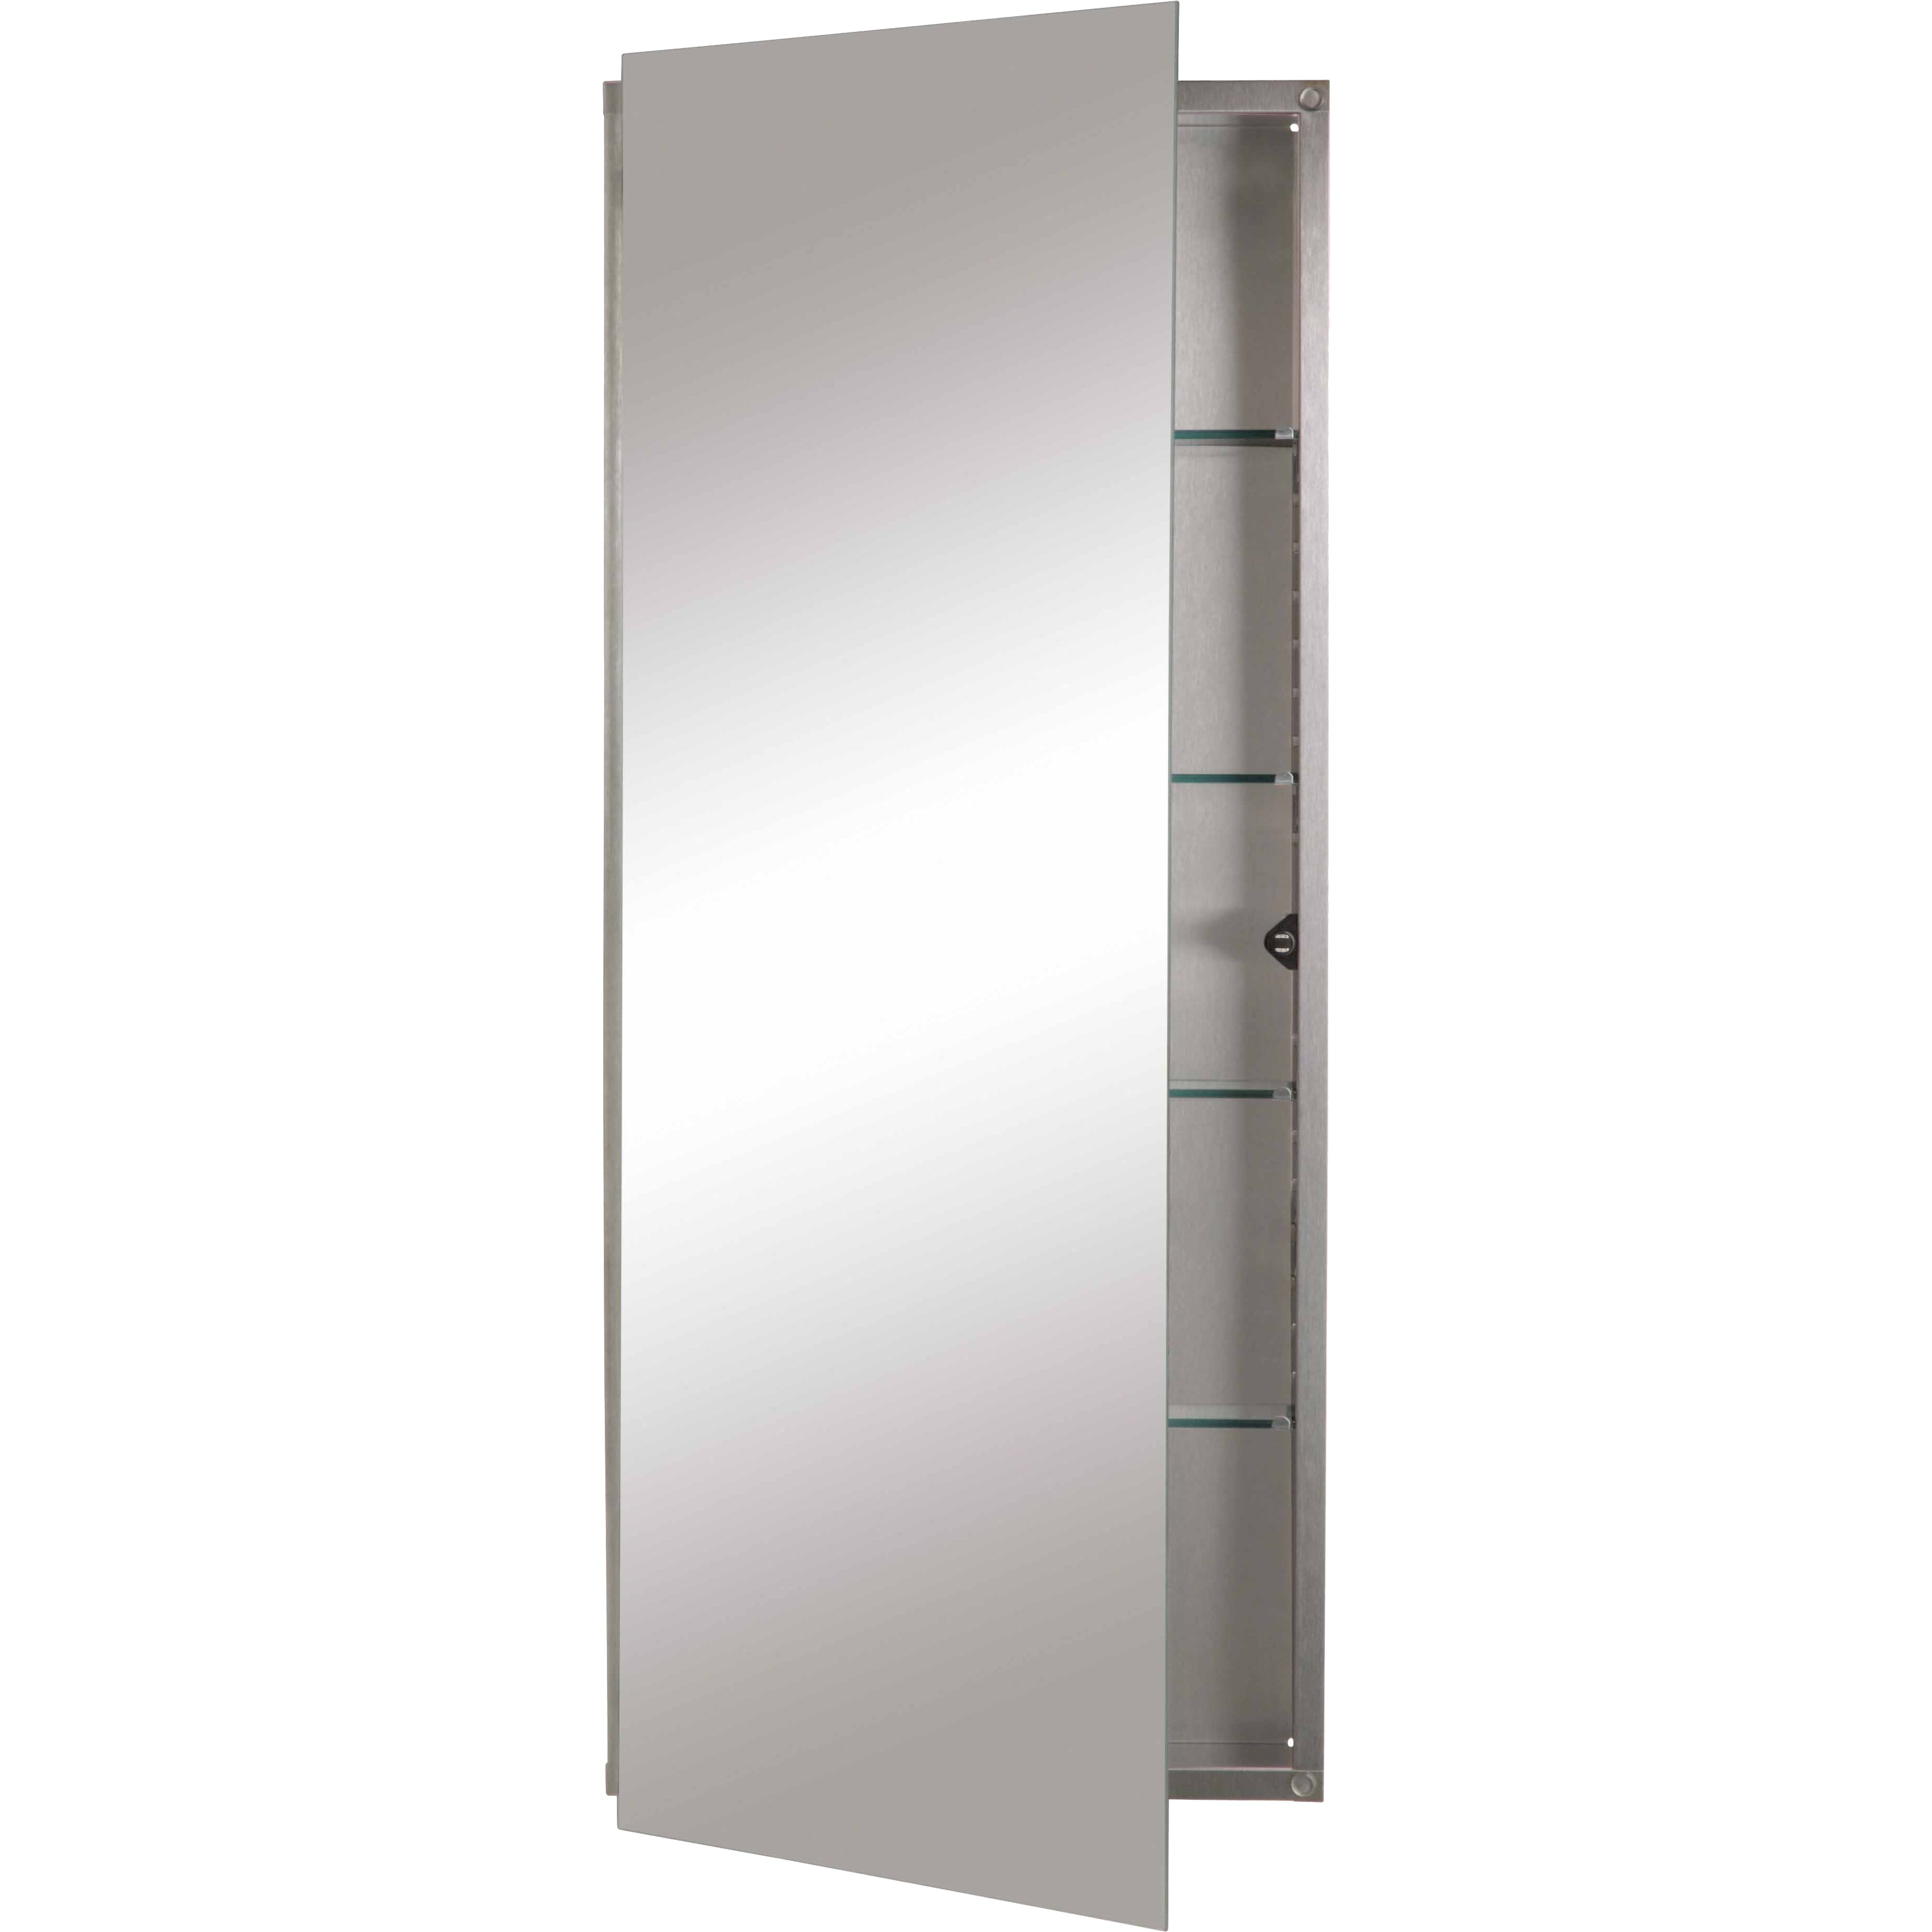 Jensen 15 x 36 recessed medicine cabinet reviews wayfair for Stand alone medicine cabinet